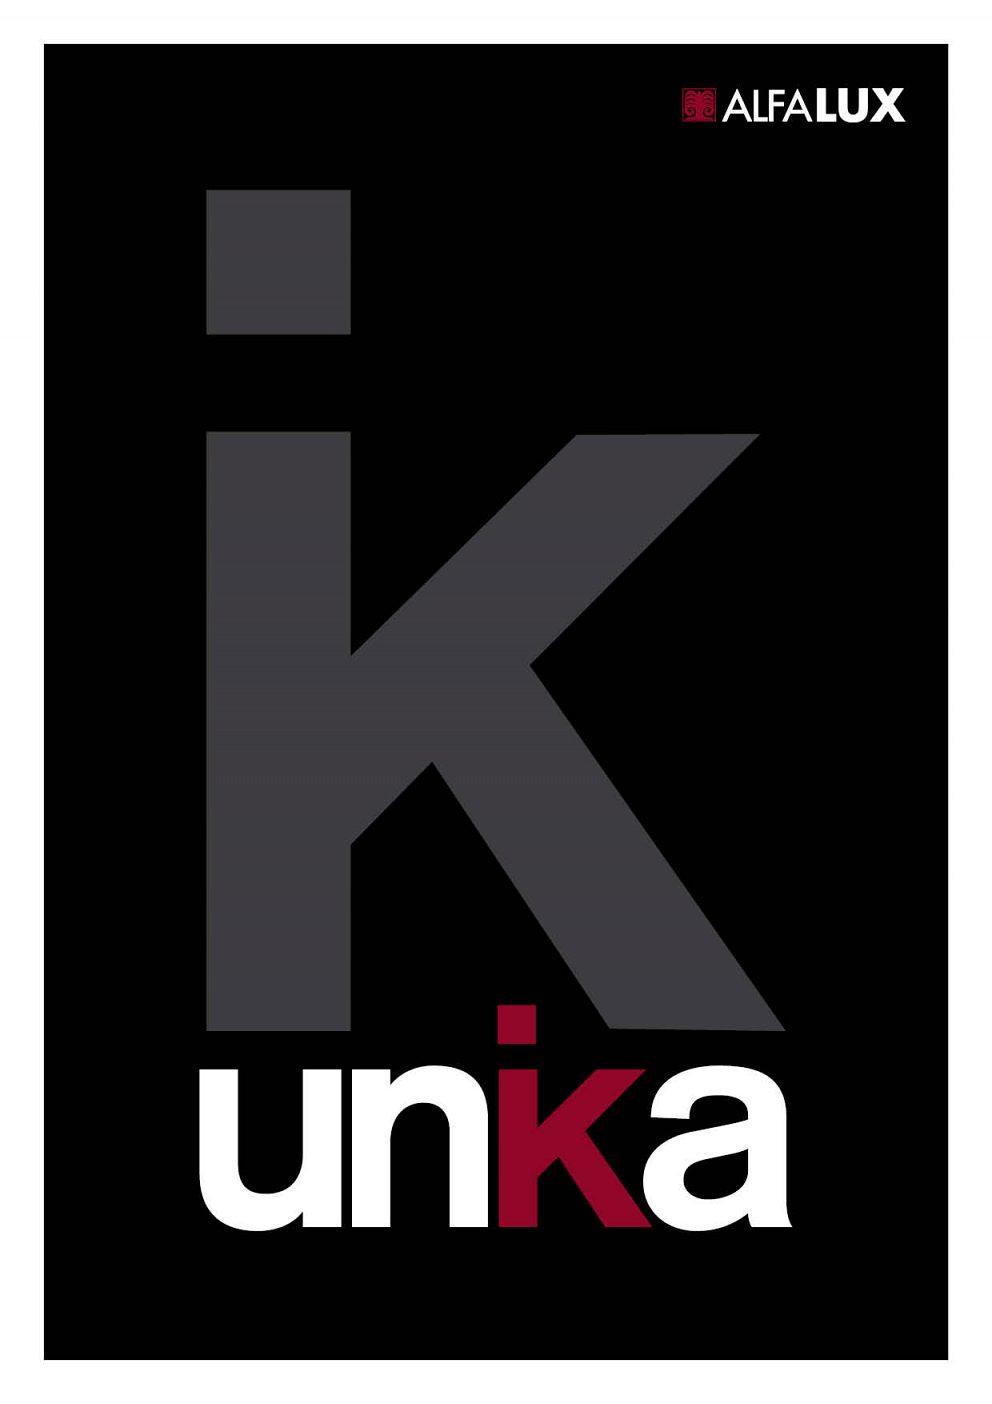 Alfalux - Unika